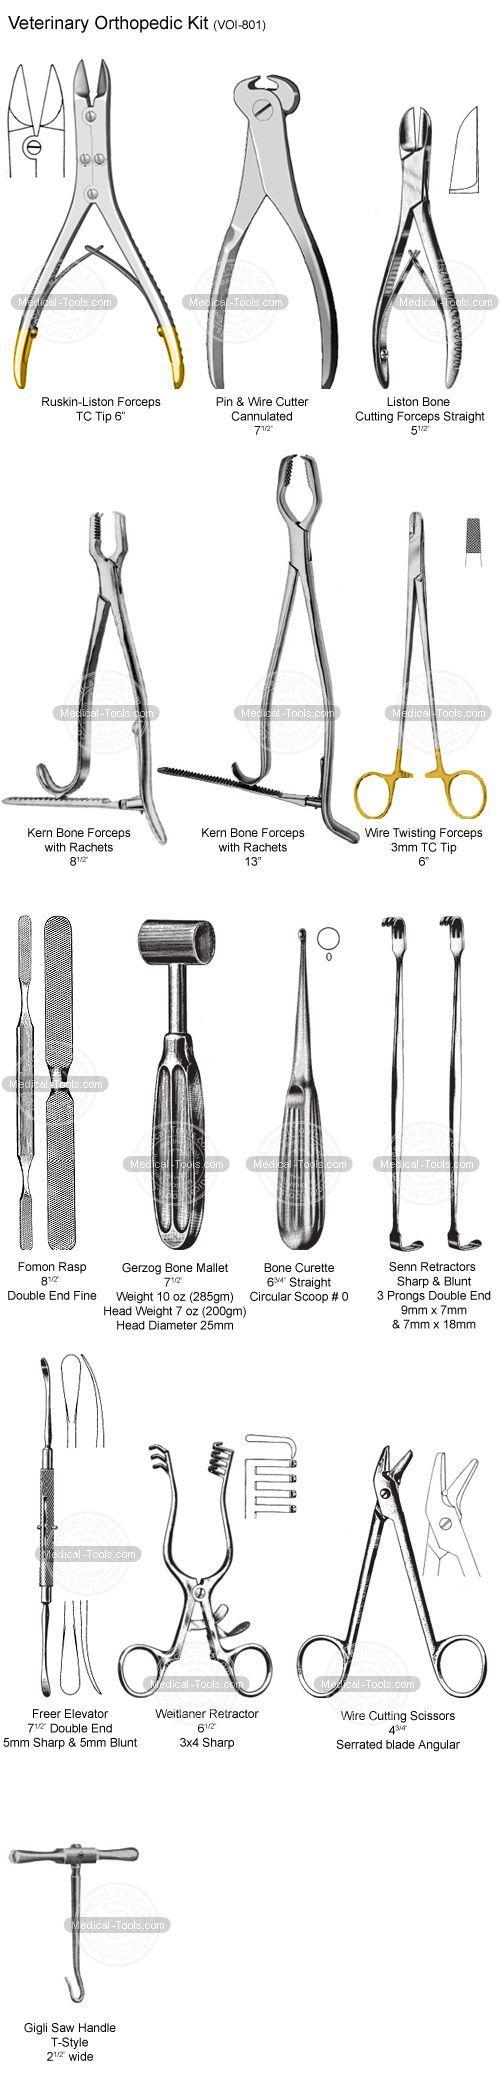 Veterinary Orthopedic Kit -Veterinary Instruments - Medical Tools Shop